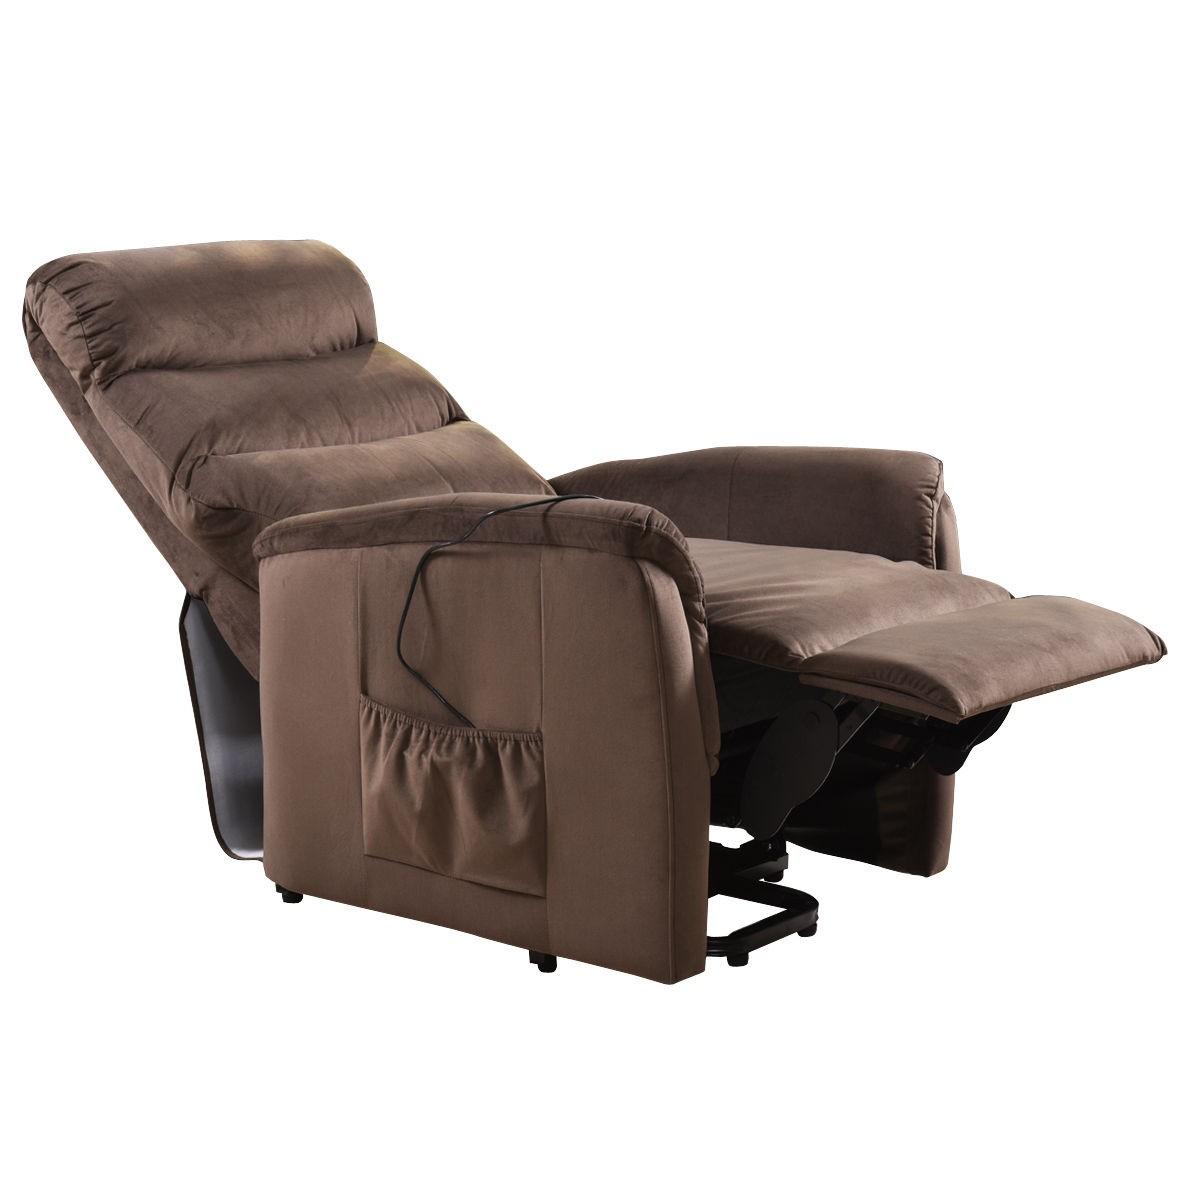 Luxury Power Lift Chair Recliner Armchair Electric Fabric  : USCHW54391d from www.ebay.com size 1200 x 1200 jpeg 96kB